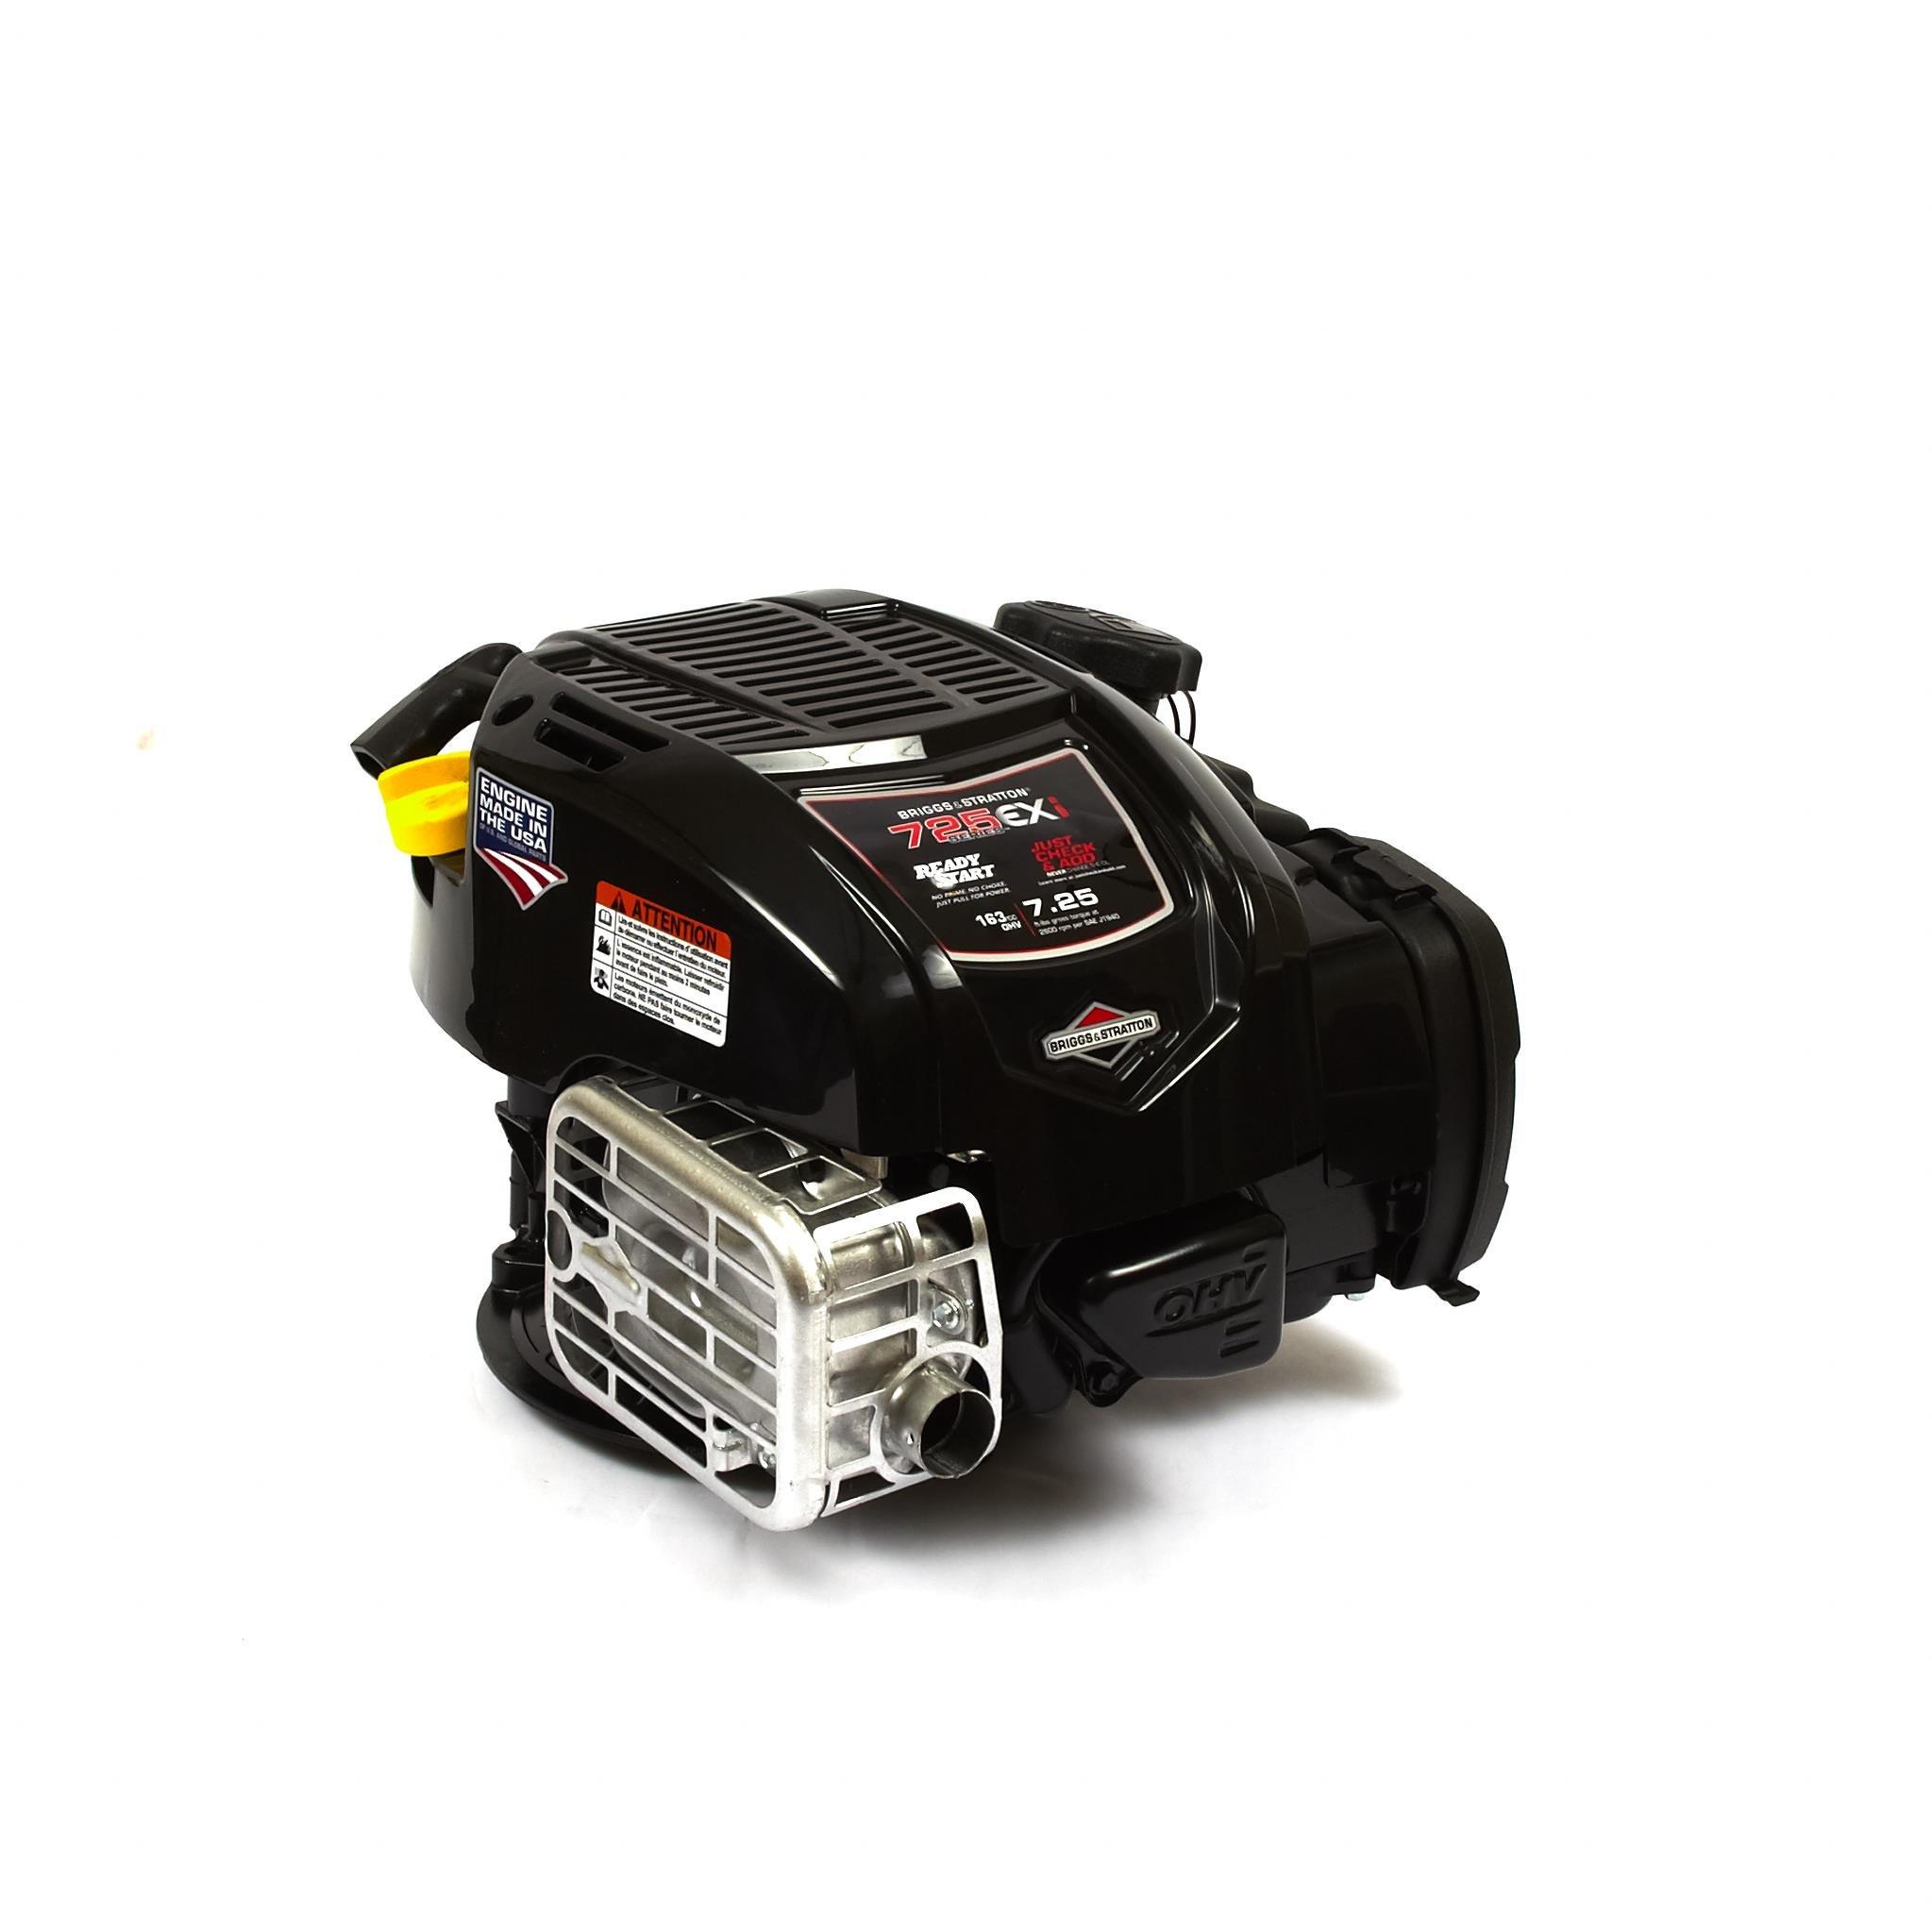 Briggs and Stratton 104M02-0028-F1 163cc 725Exi Series Push Mower Engine